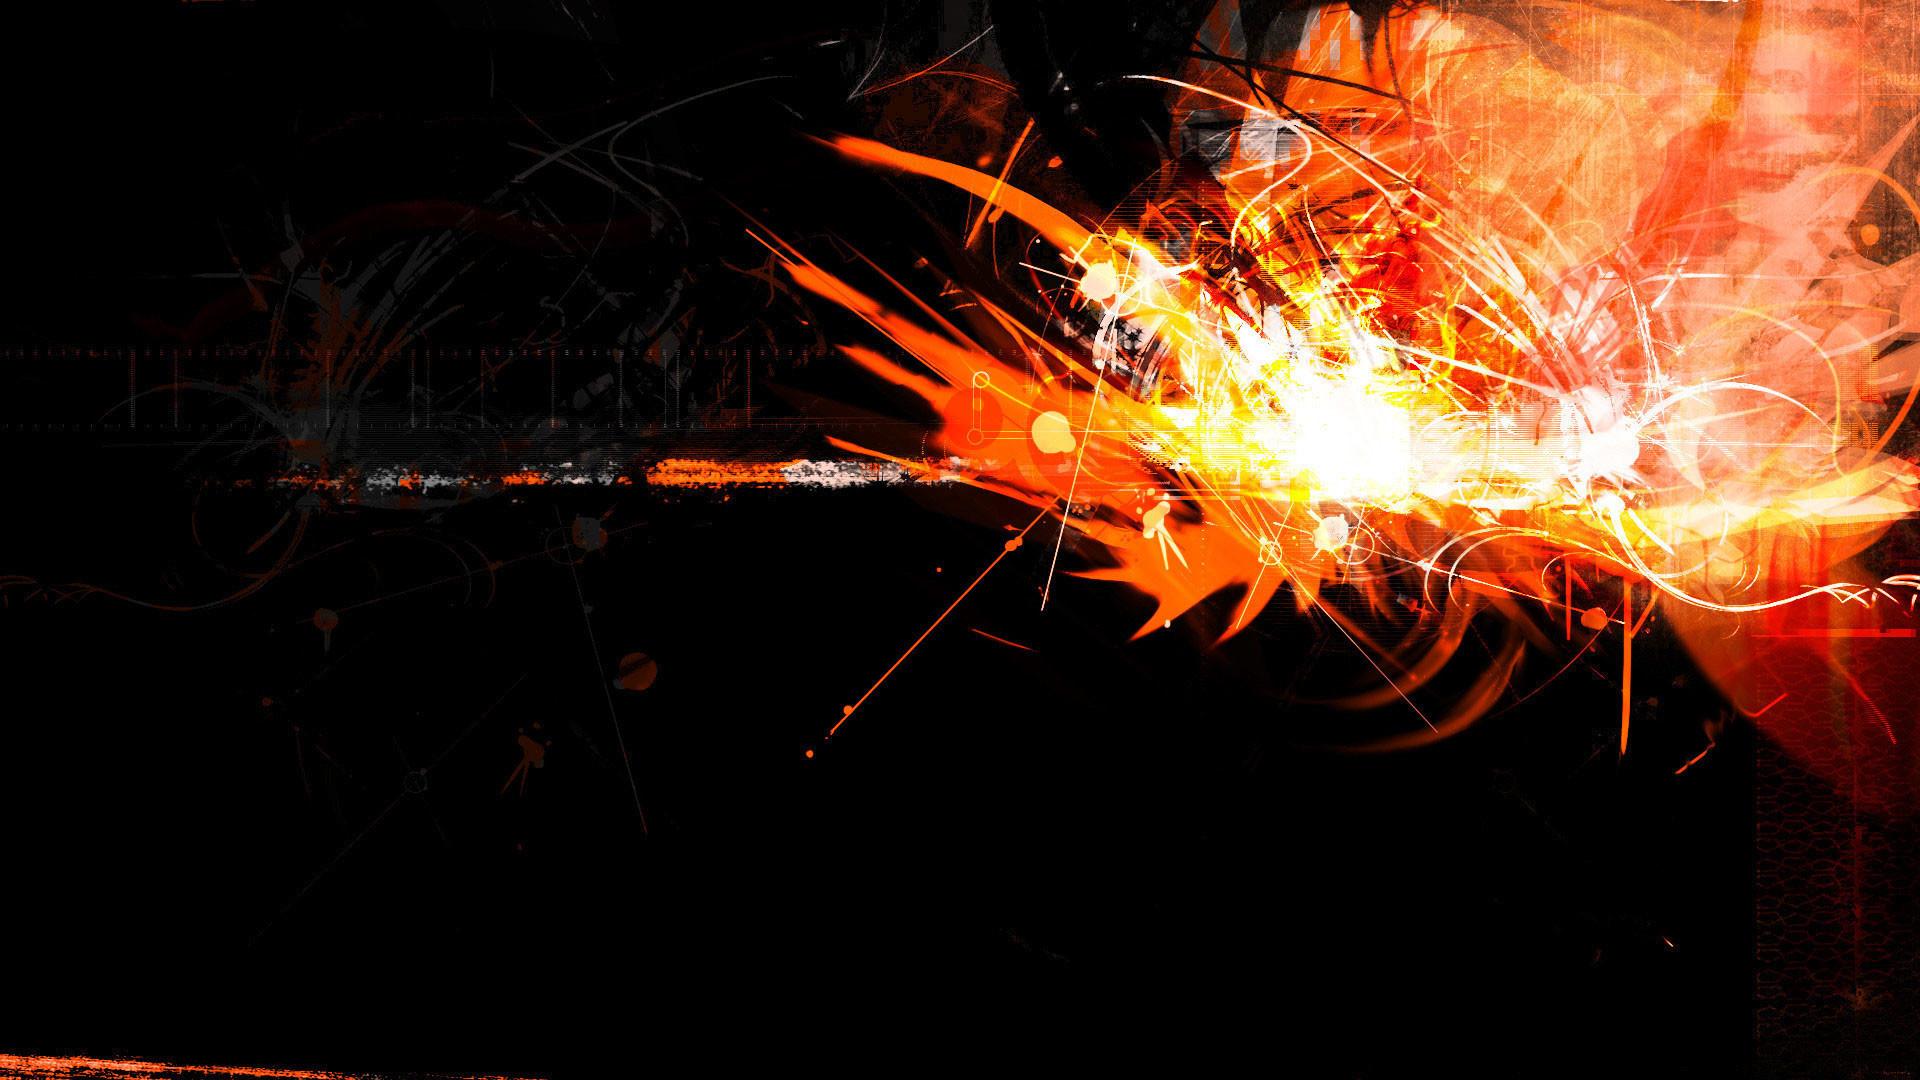 hd pics photos abstract neon black orange hd quality desktop background  wallpaper